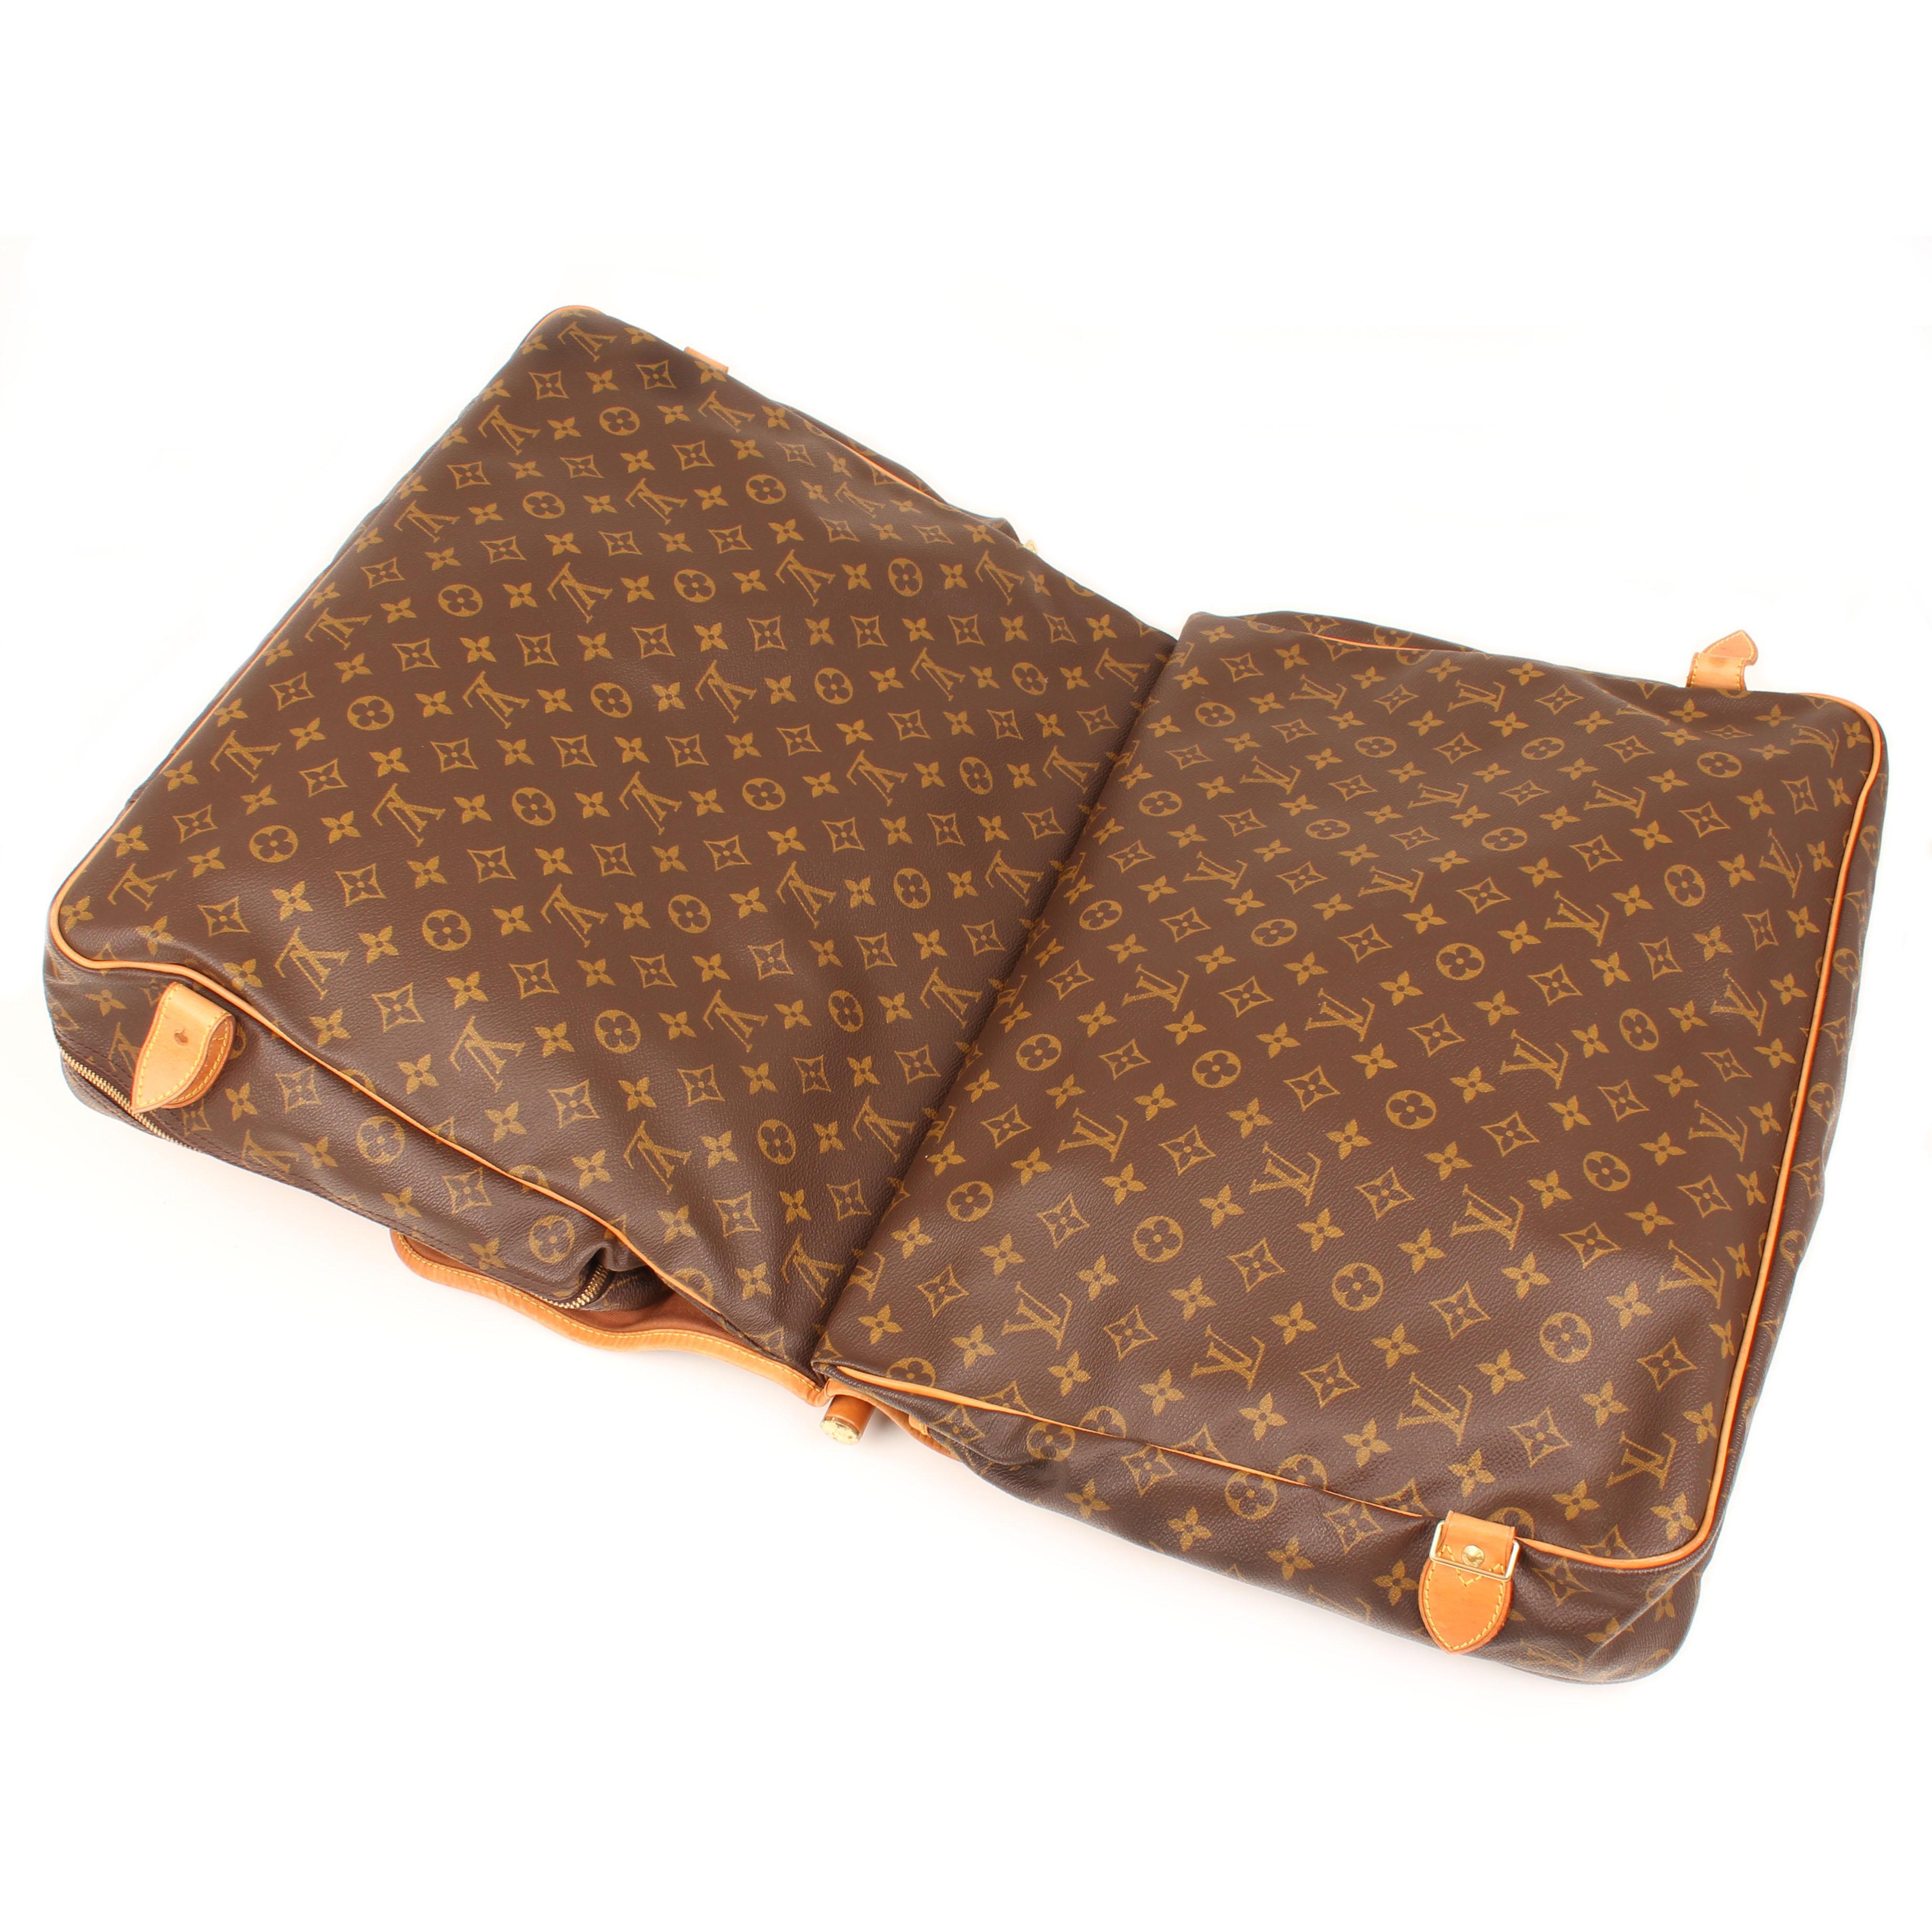 bolsa de viaje louis vuitton sac chasse monogram abierta